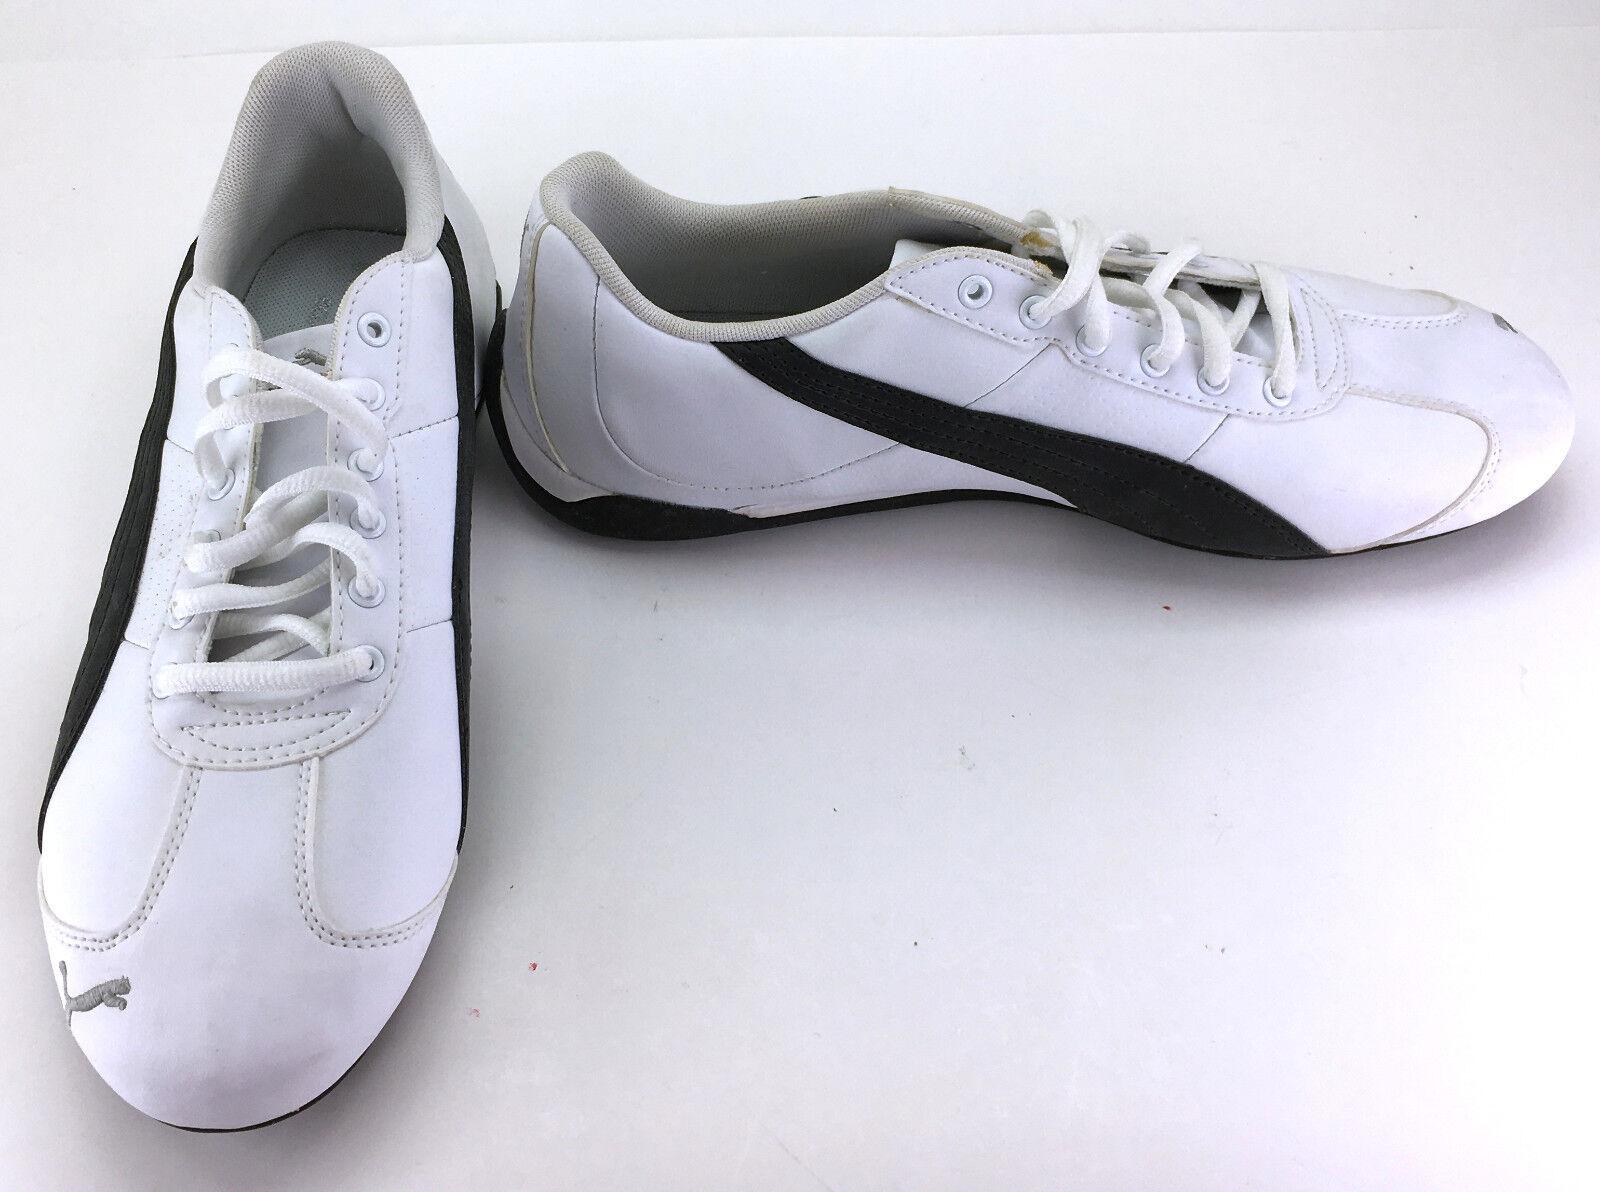 Puma shoes Repli Cat III 3 LT White Black Sneakers Size 8.5